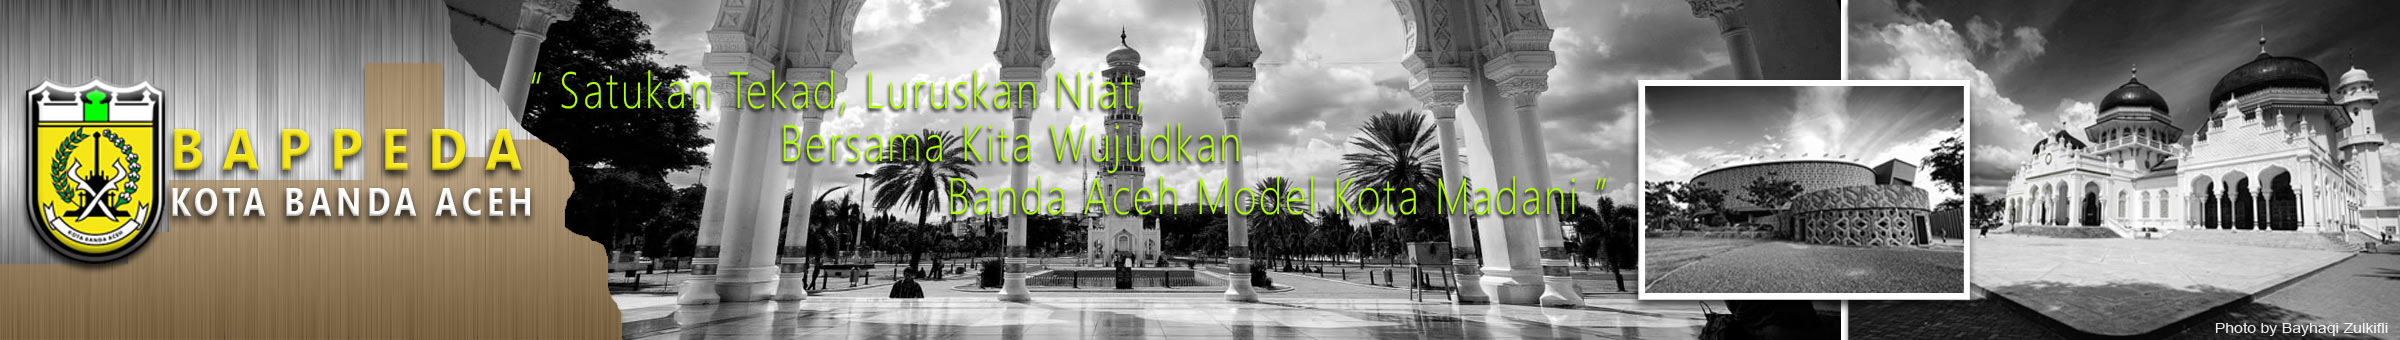 Bappeda Banda Aceh